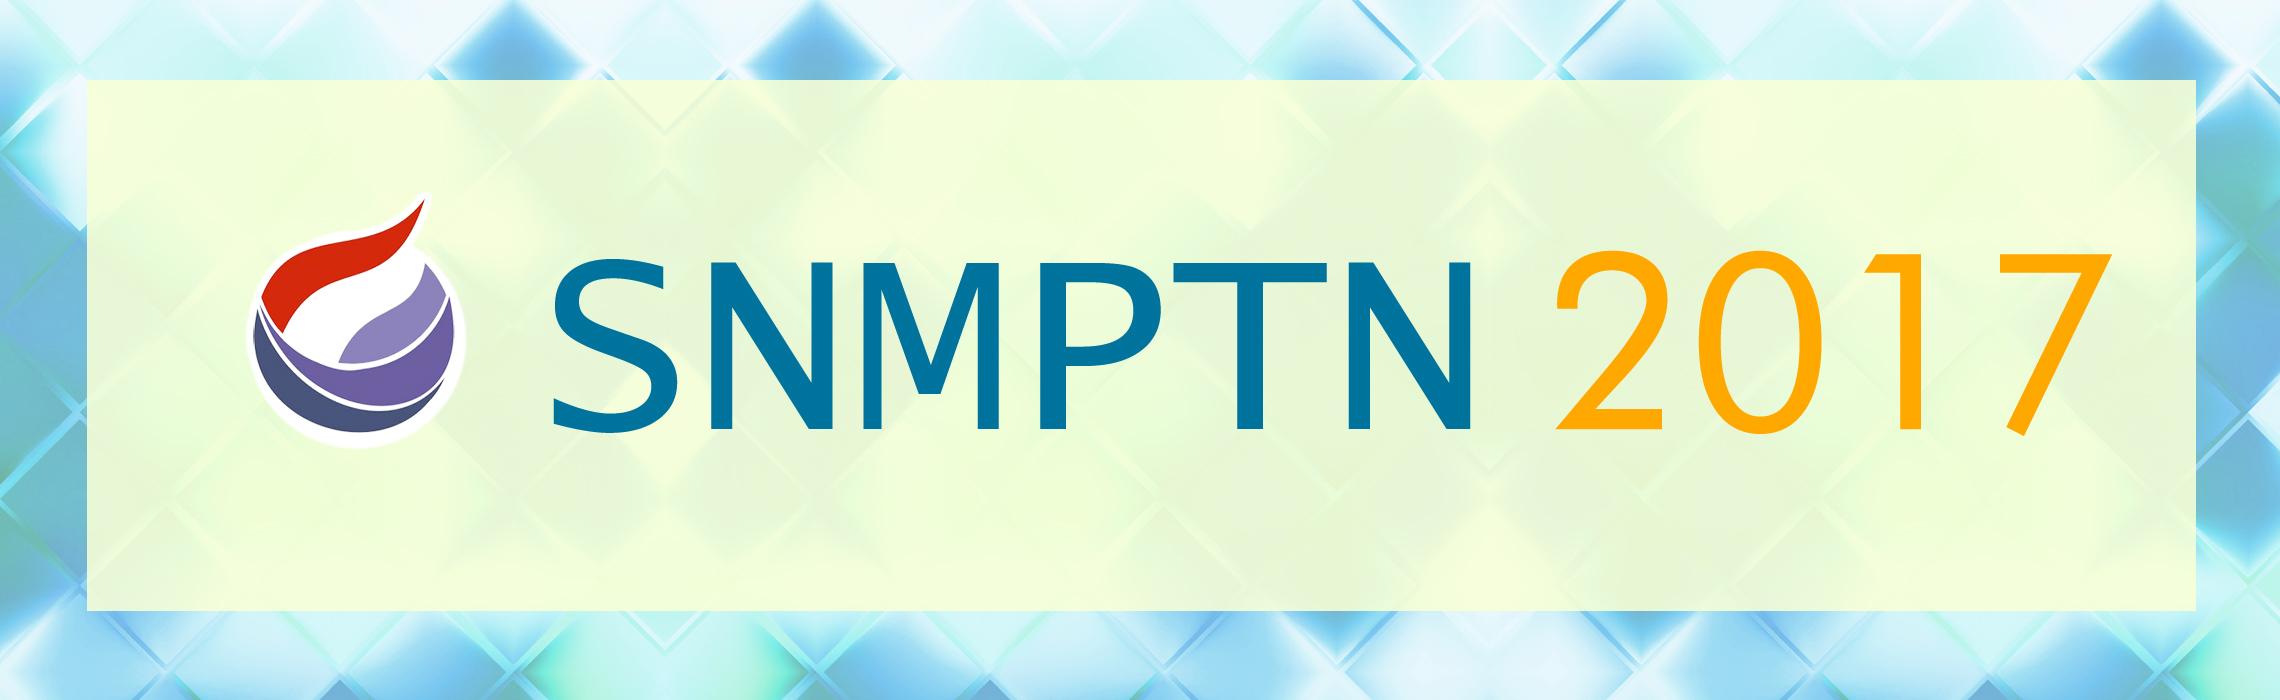 SNMPTN-banner-copy